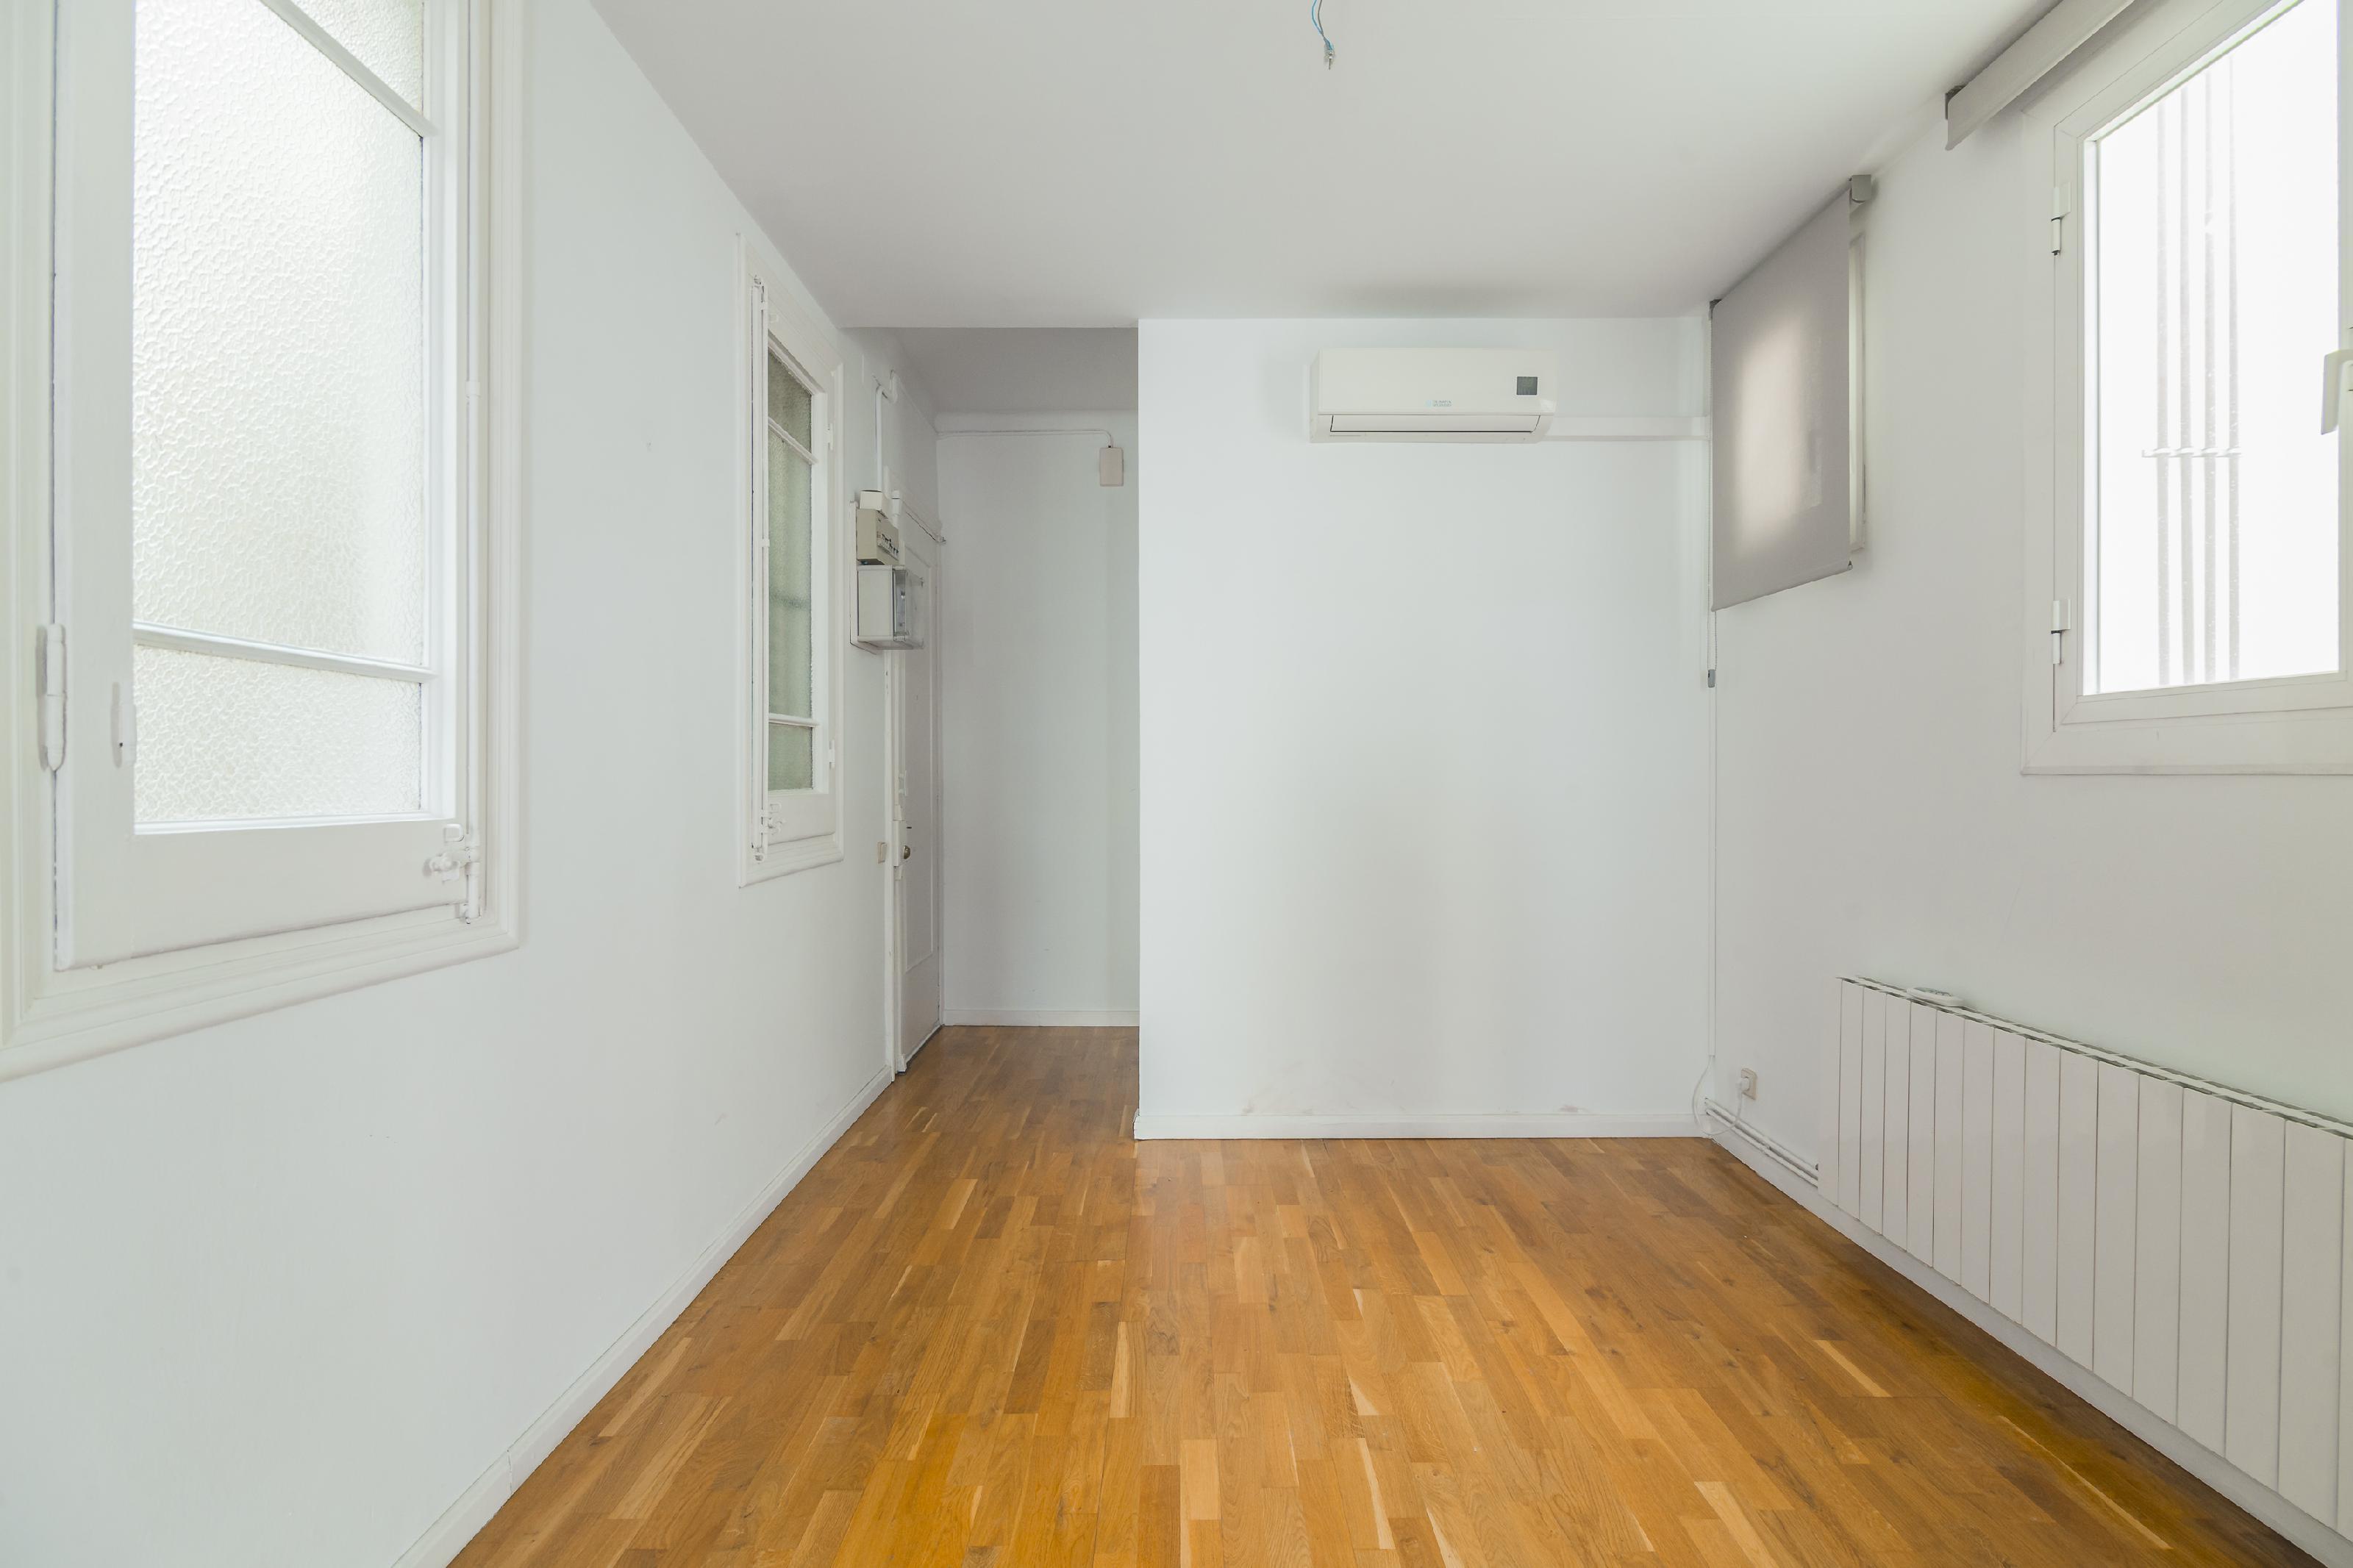 246907 Flat for sale in Eixample, Nova Esquerra Eixample 23